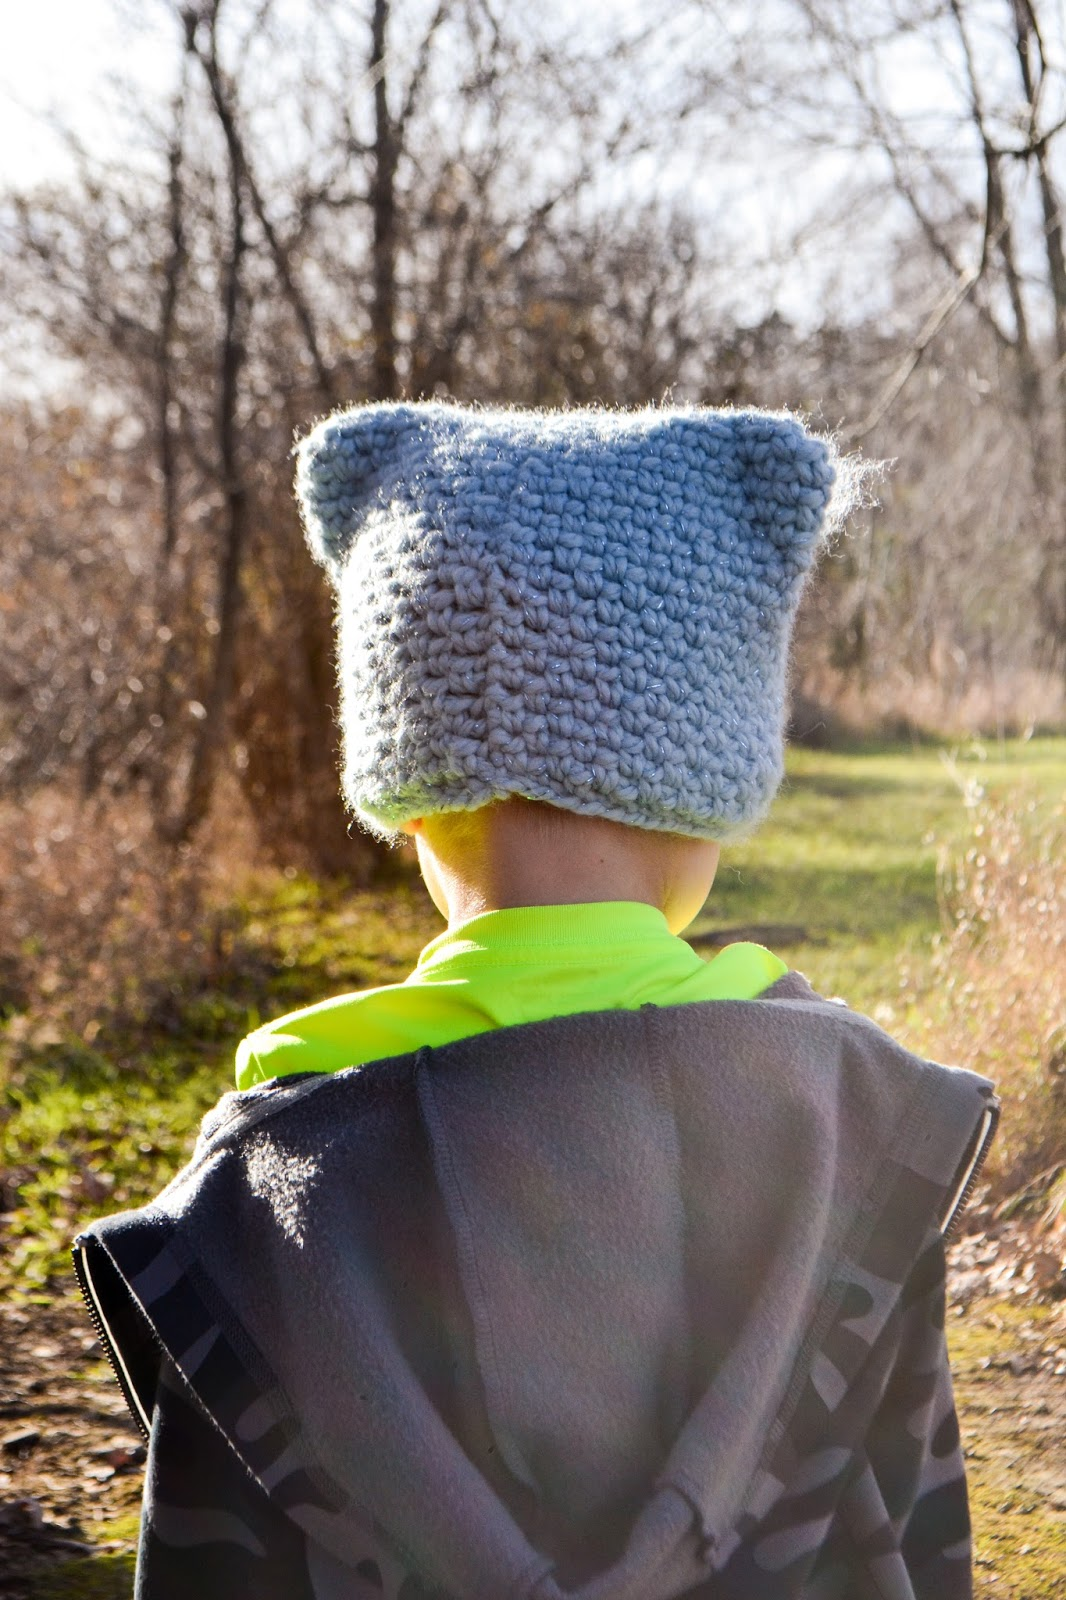 Crochet cat ears - Free patterns and tutorials - Crochet Now | 1600x1066